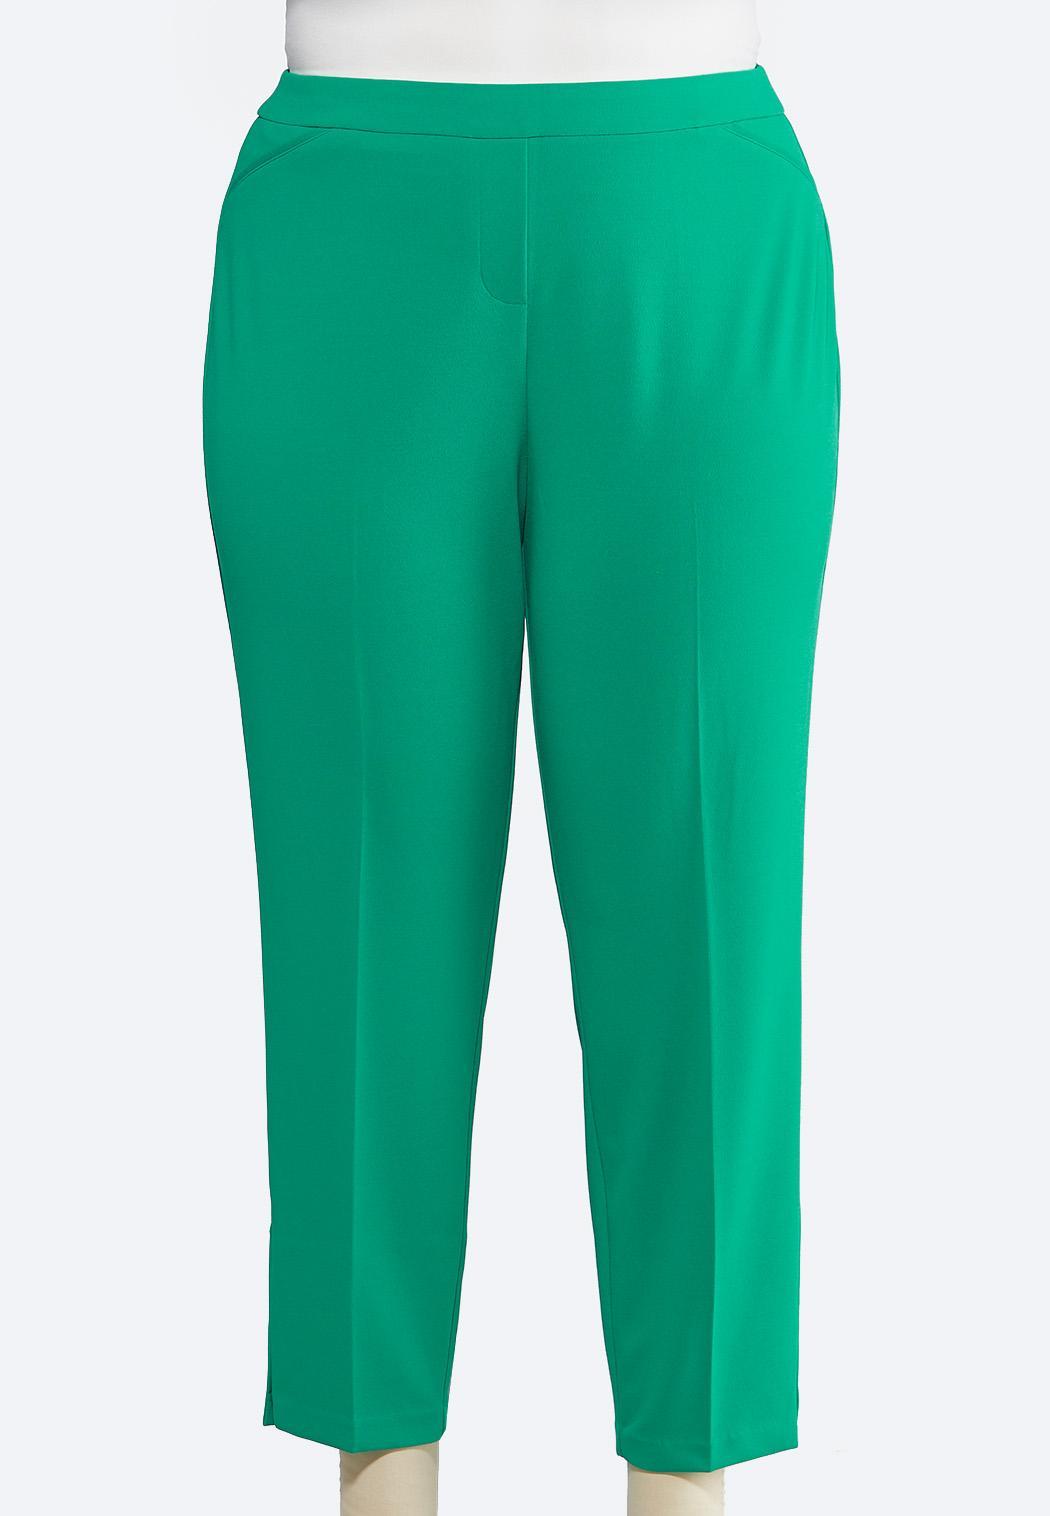 cccc3e572b Plus Size Green Slim Ankle Pants Pants Cato Fashions